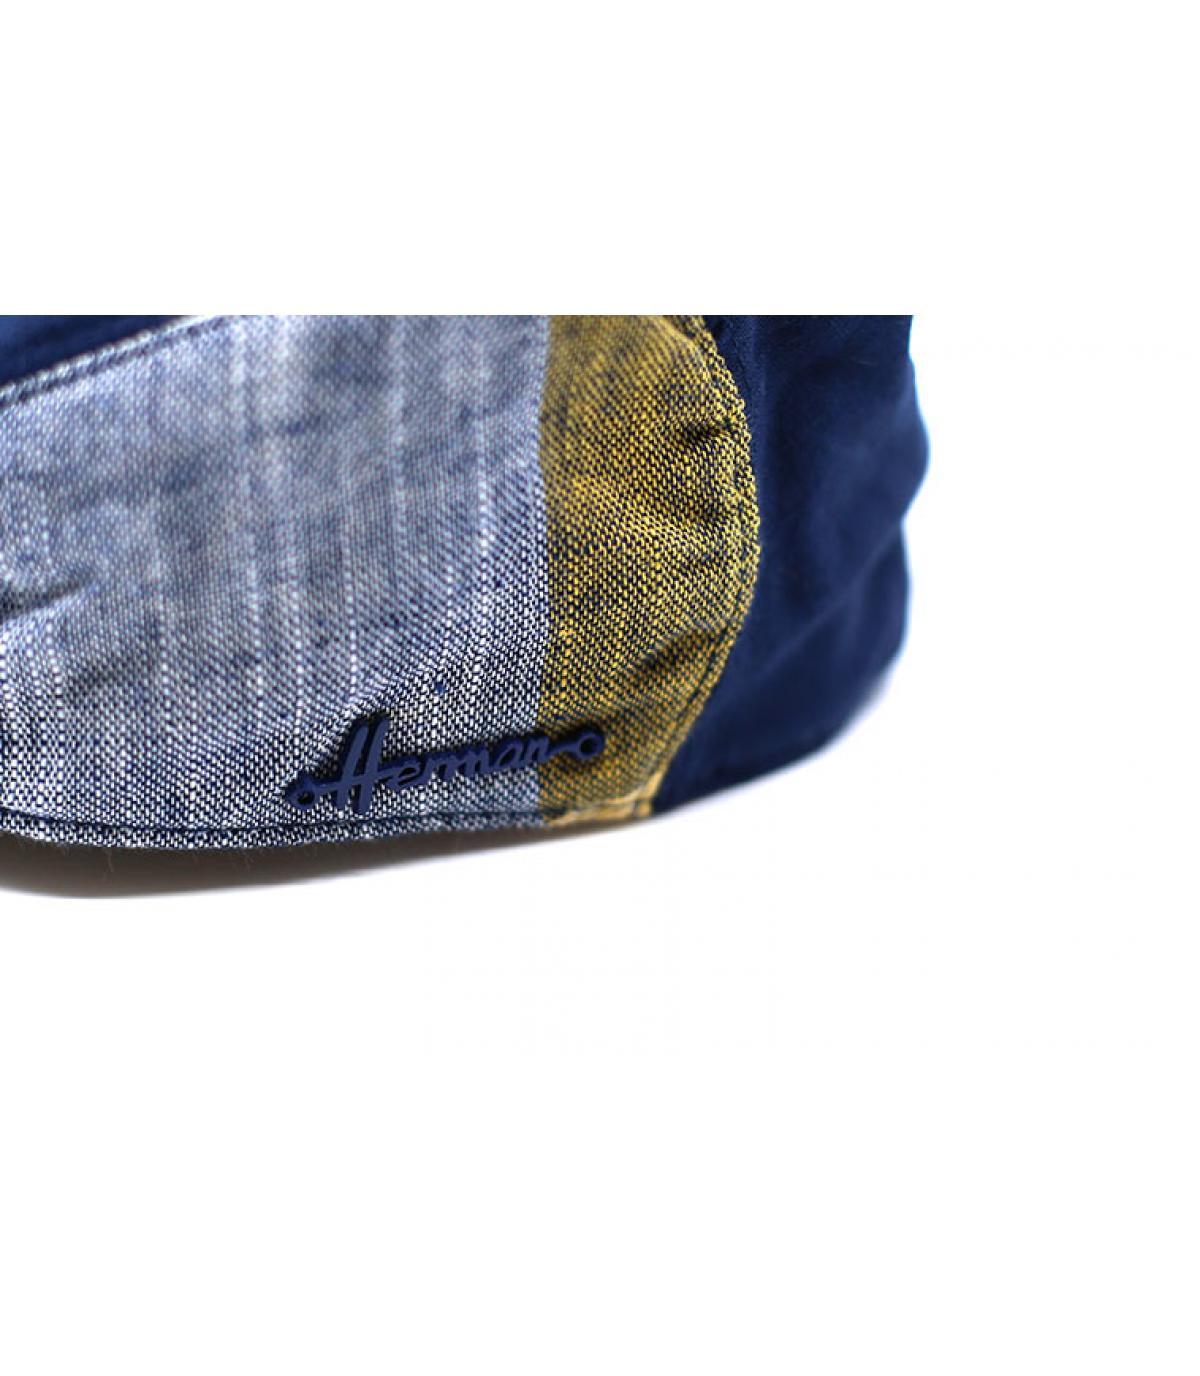 Details Range blue - Abbildung 3